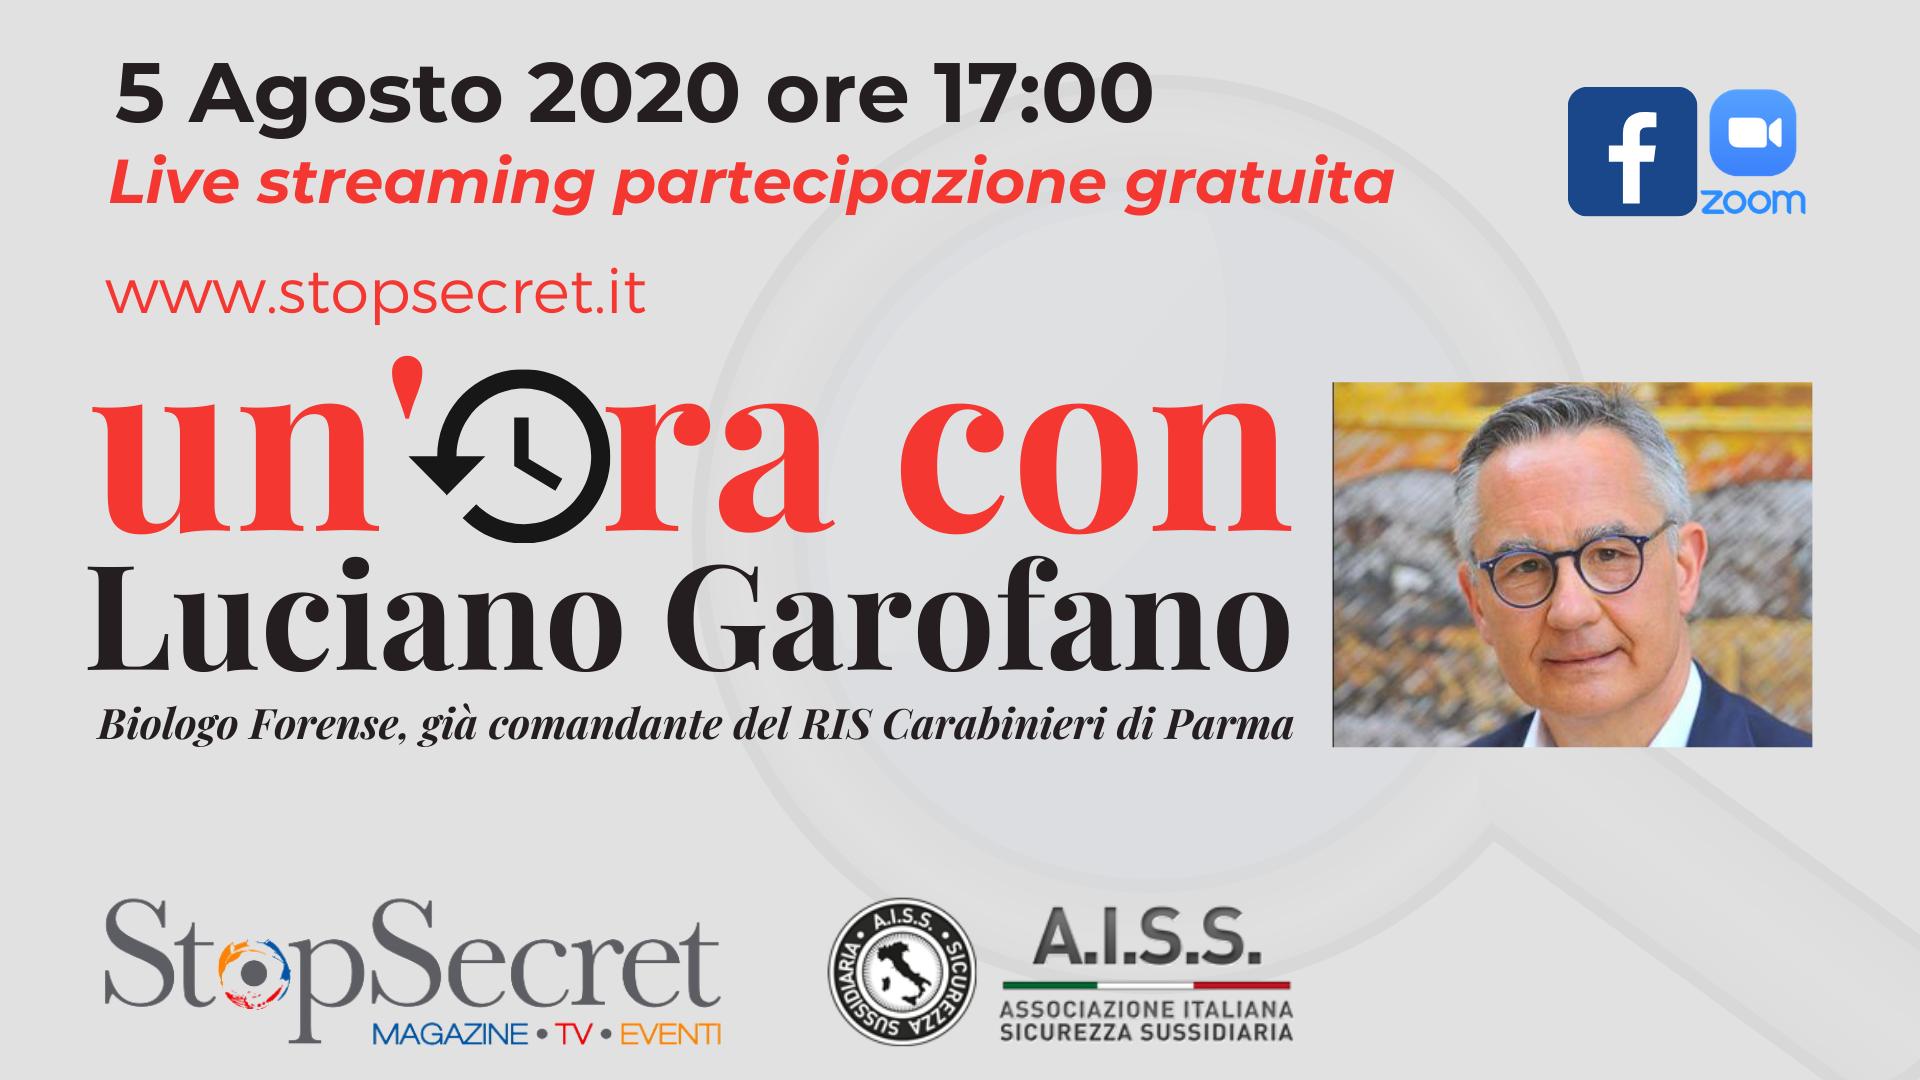 Un'ora con : Luciano Garofano, biologo forense, già Comandante del RIS Carabinieri di Parma